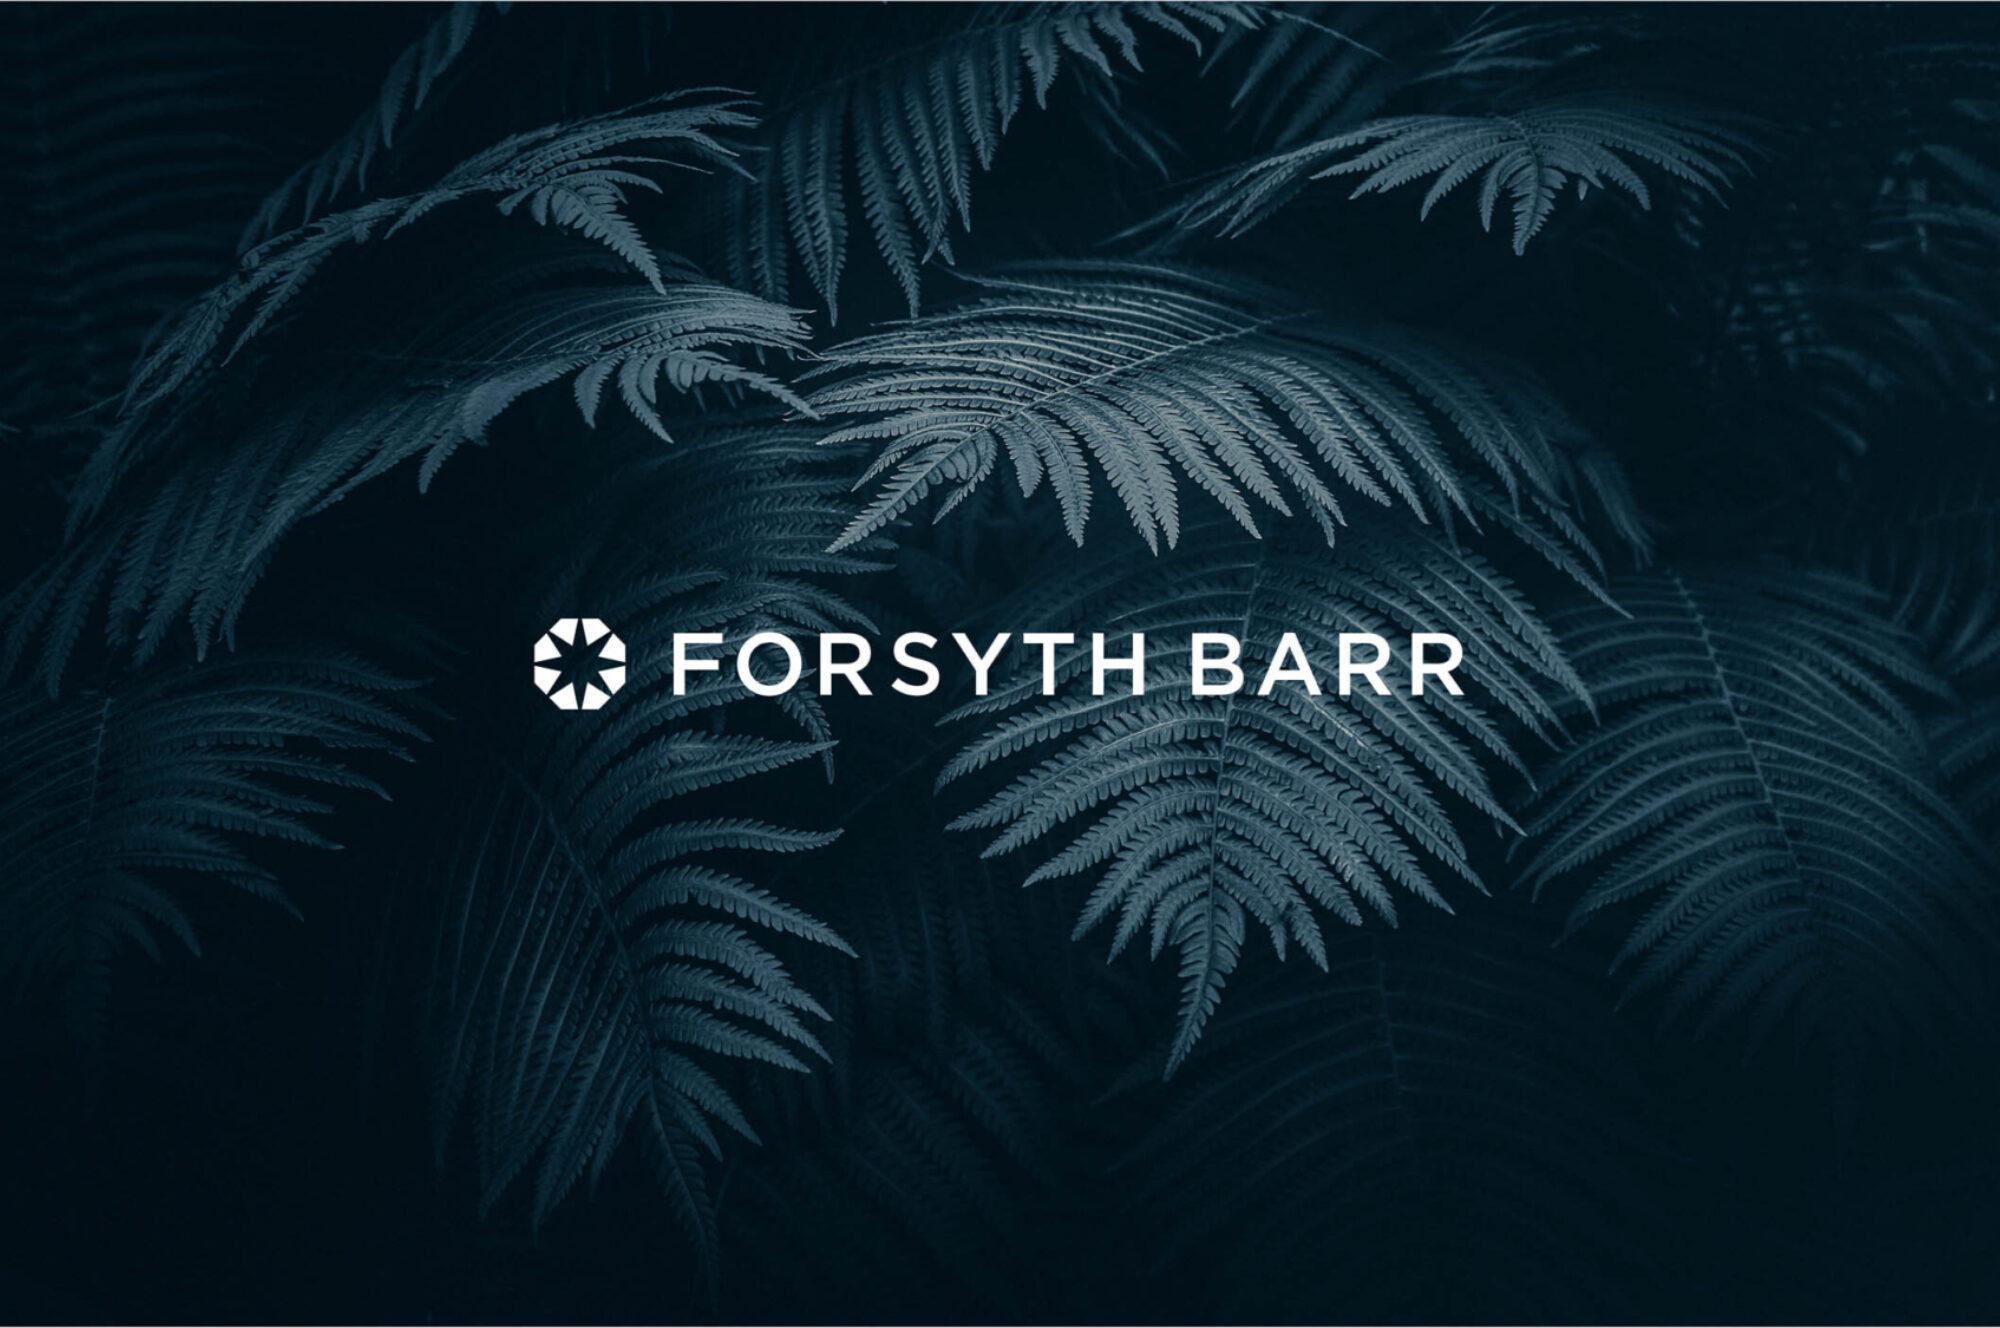 Forsyth barr case study 2020 04 Page 01